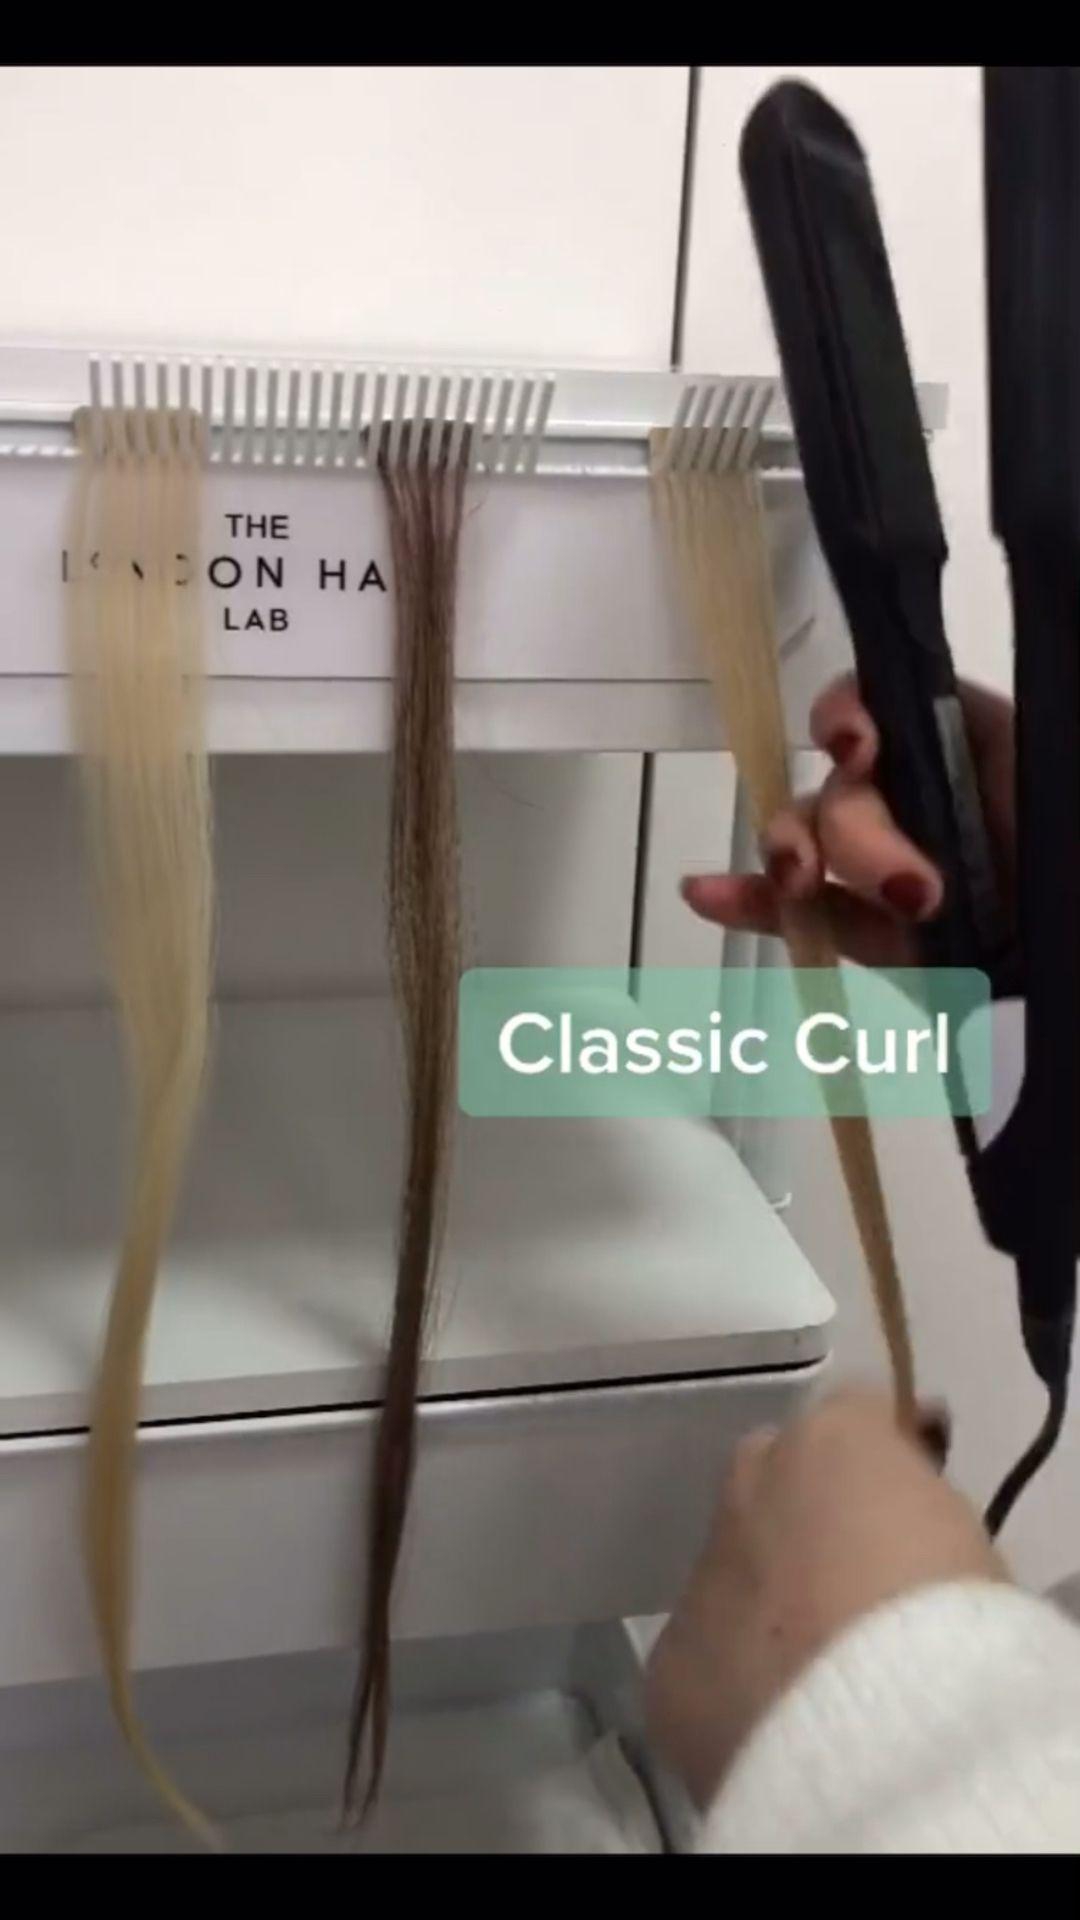 FLAT IRON CURLS hair tutorial. Tiktok viral video.